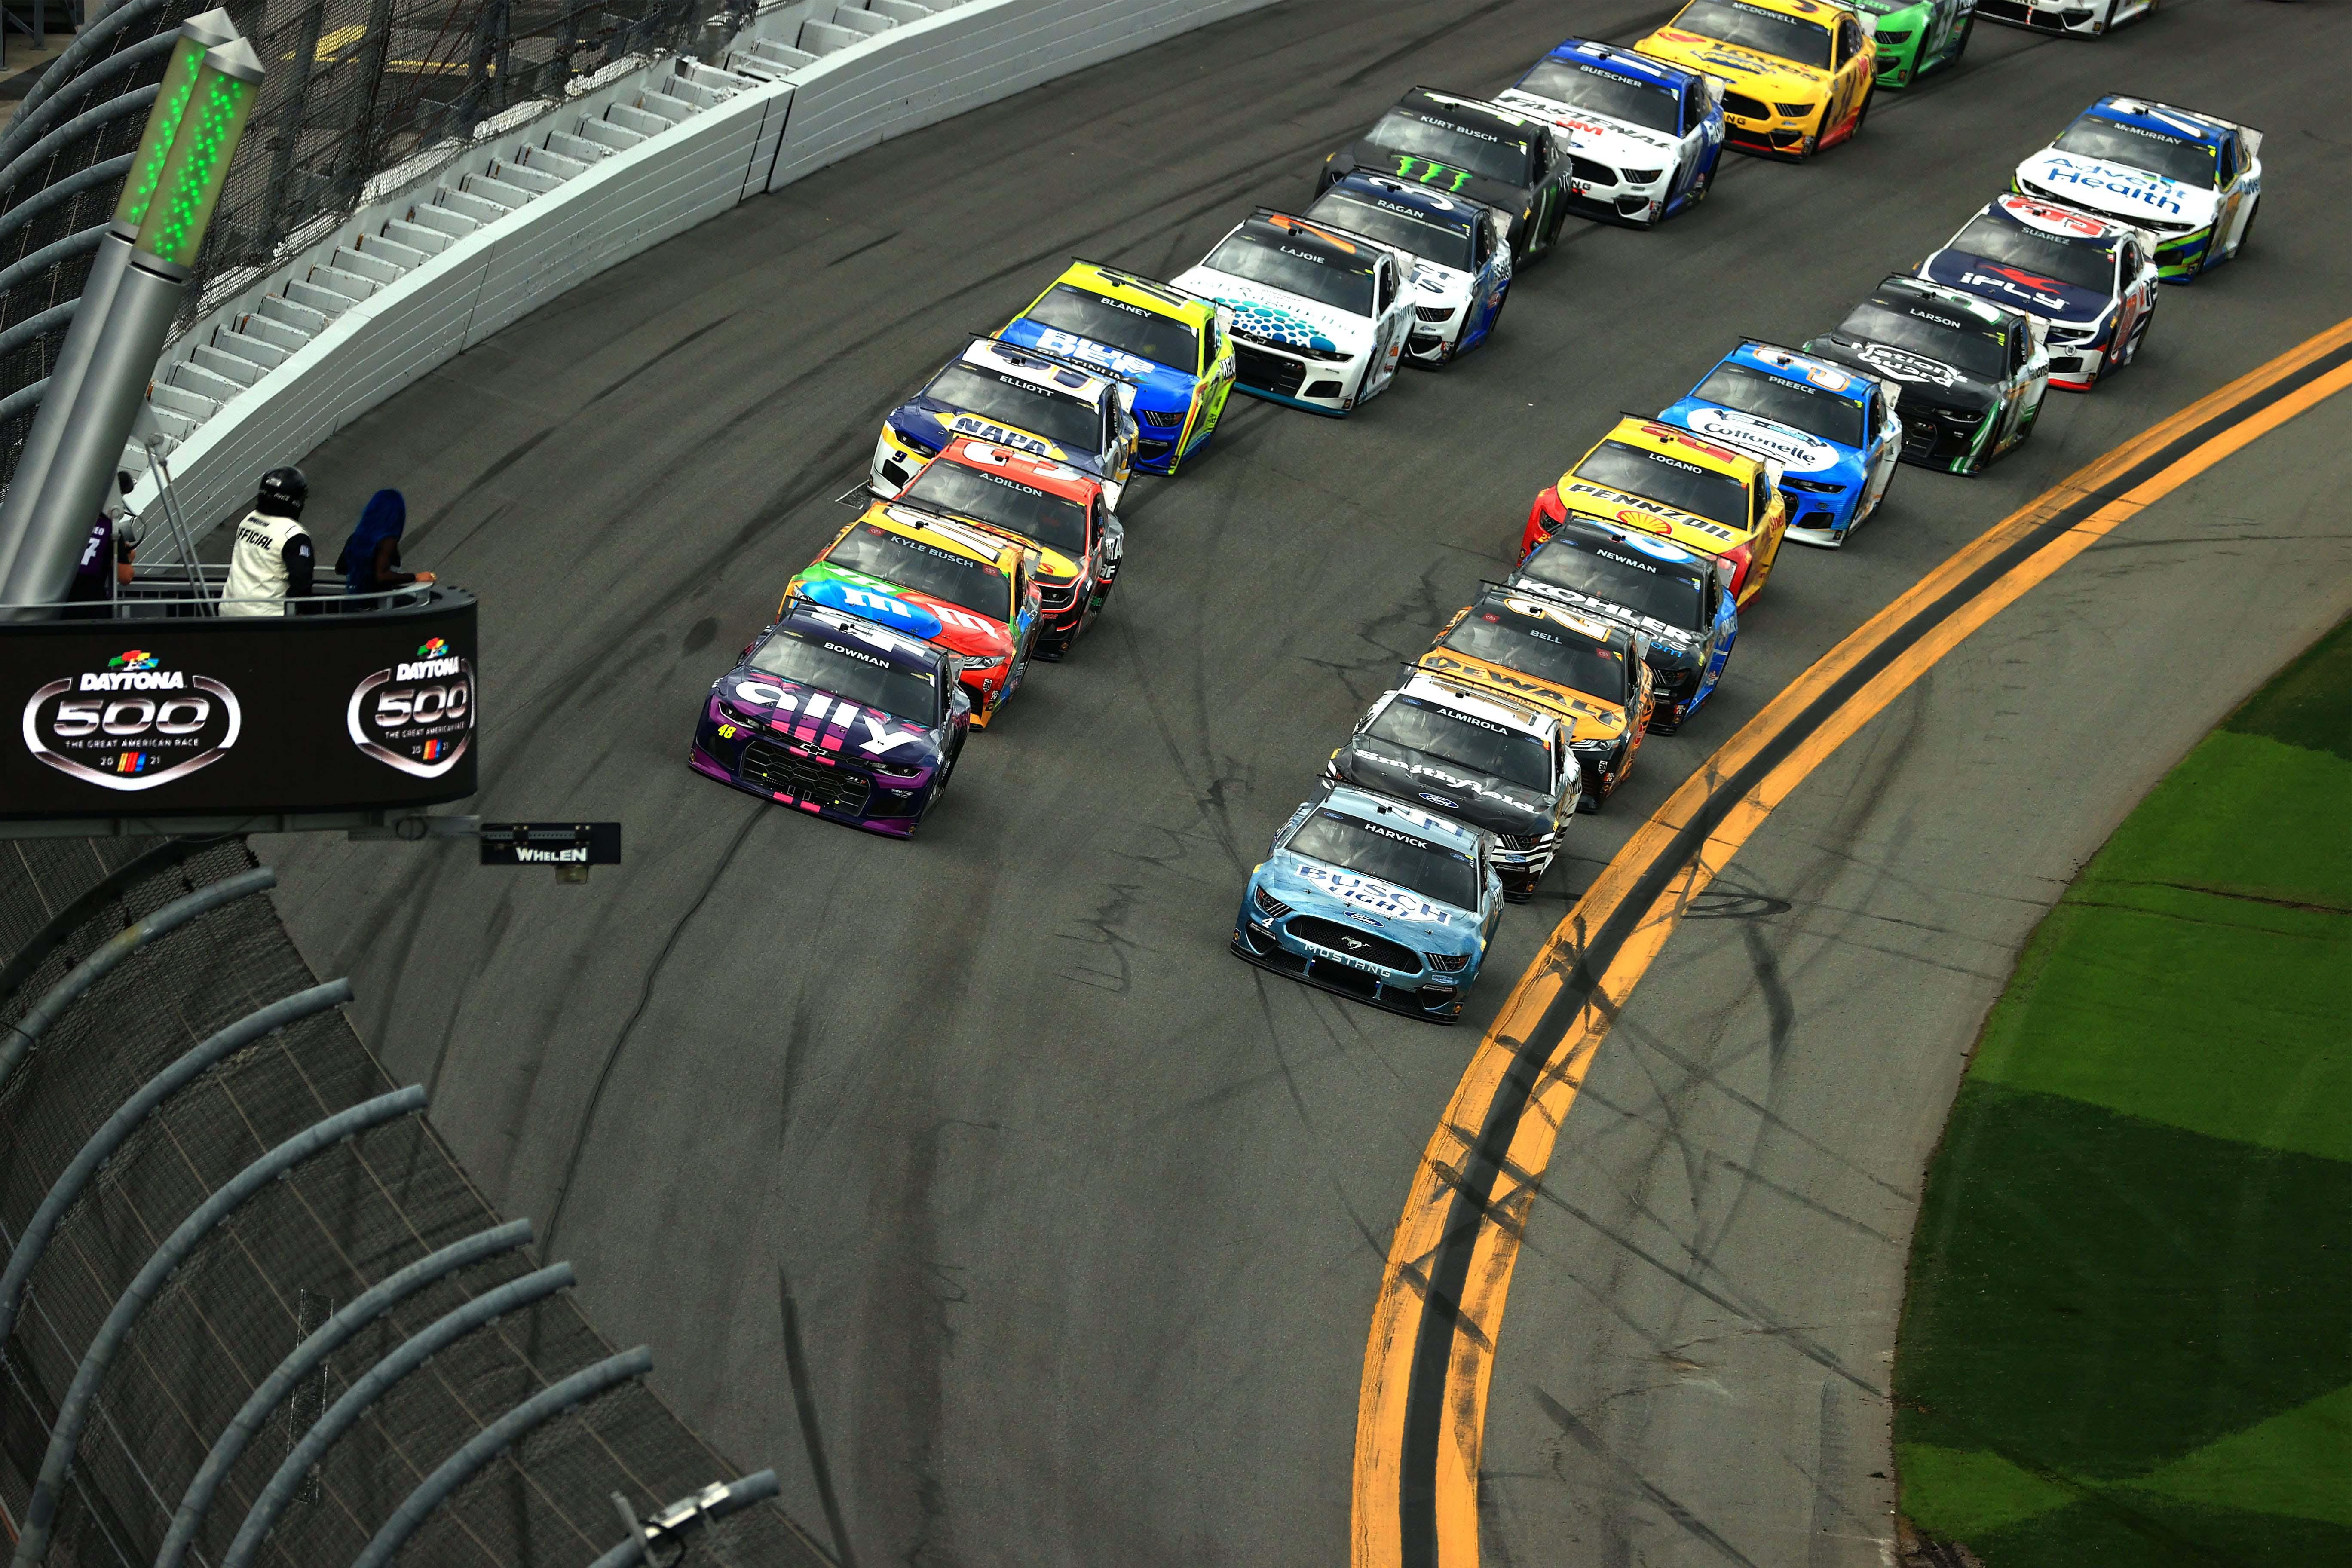 Daytona 500 - NASCAR Cup Series - Daytona International Speedway